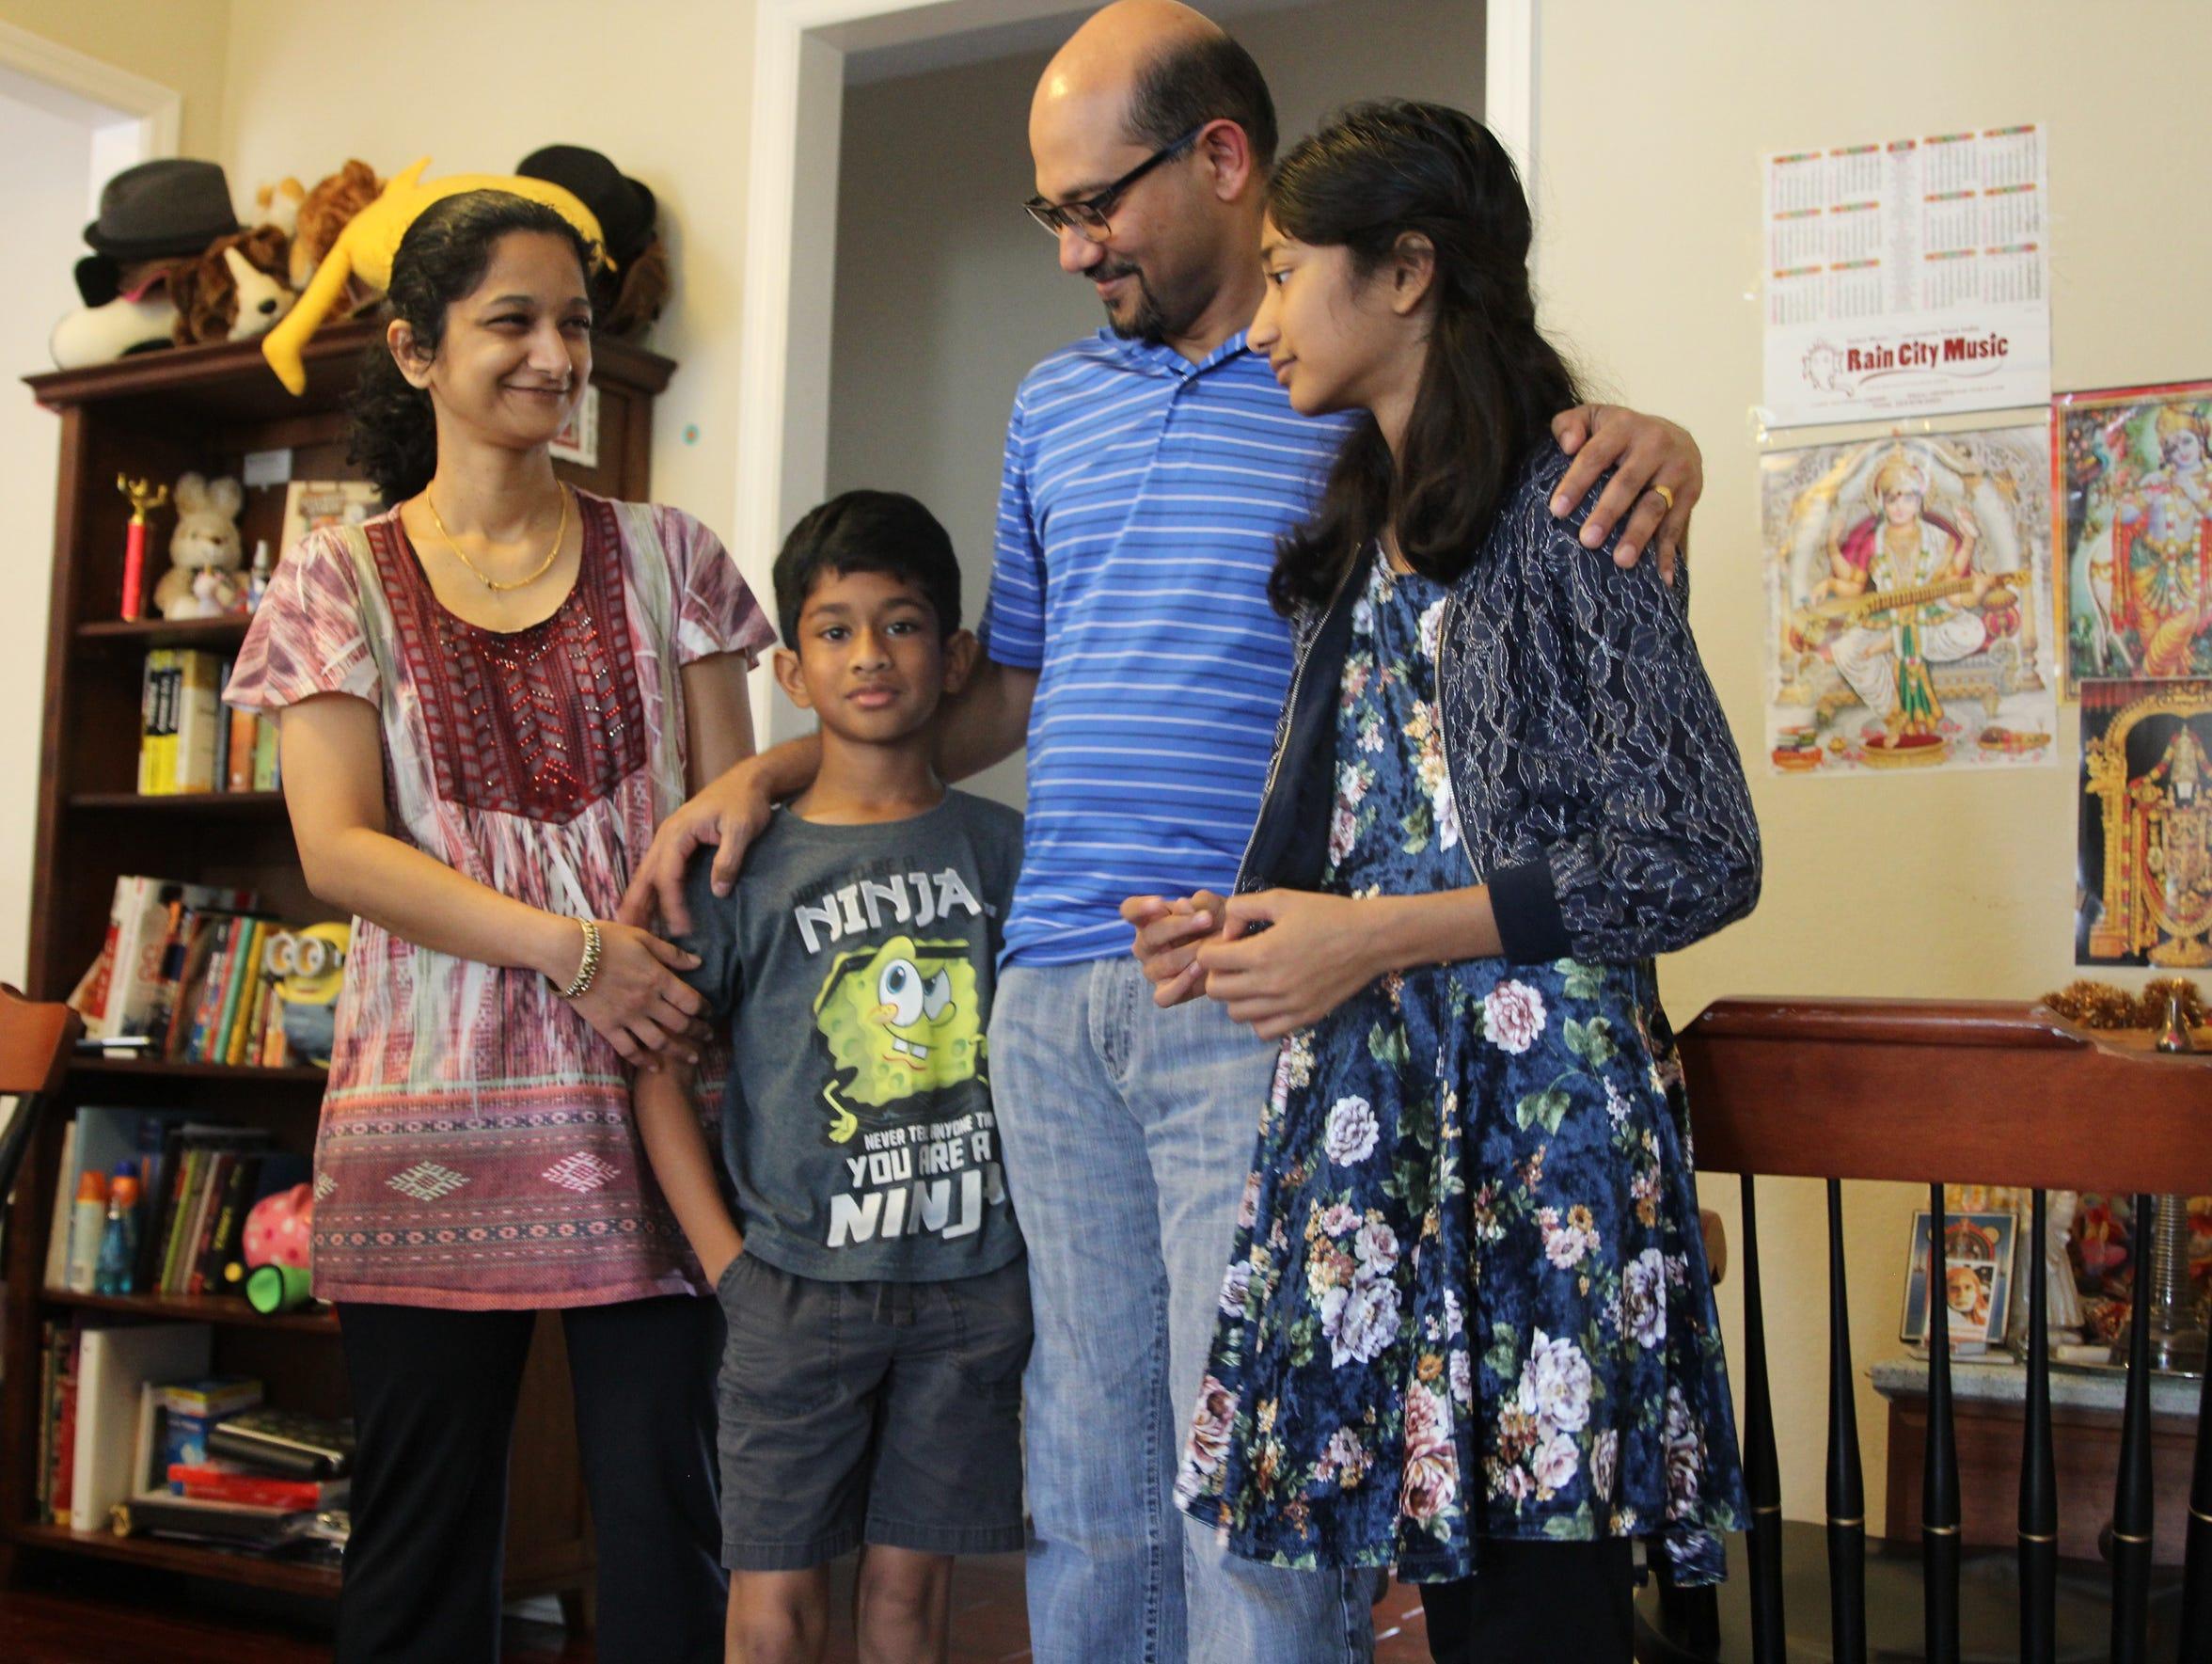 Chitra Mony, left, and Narayanan Krishnamoorthy, middle,